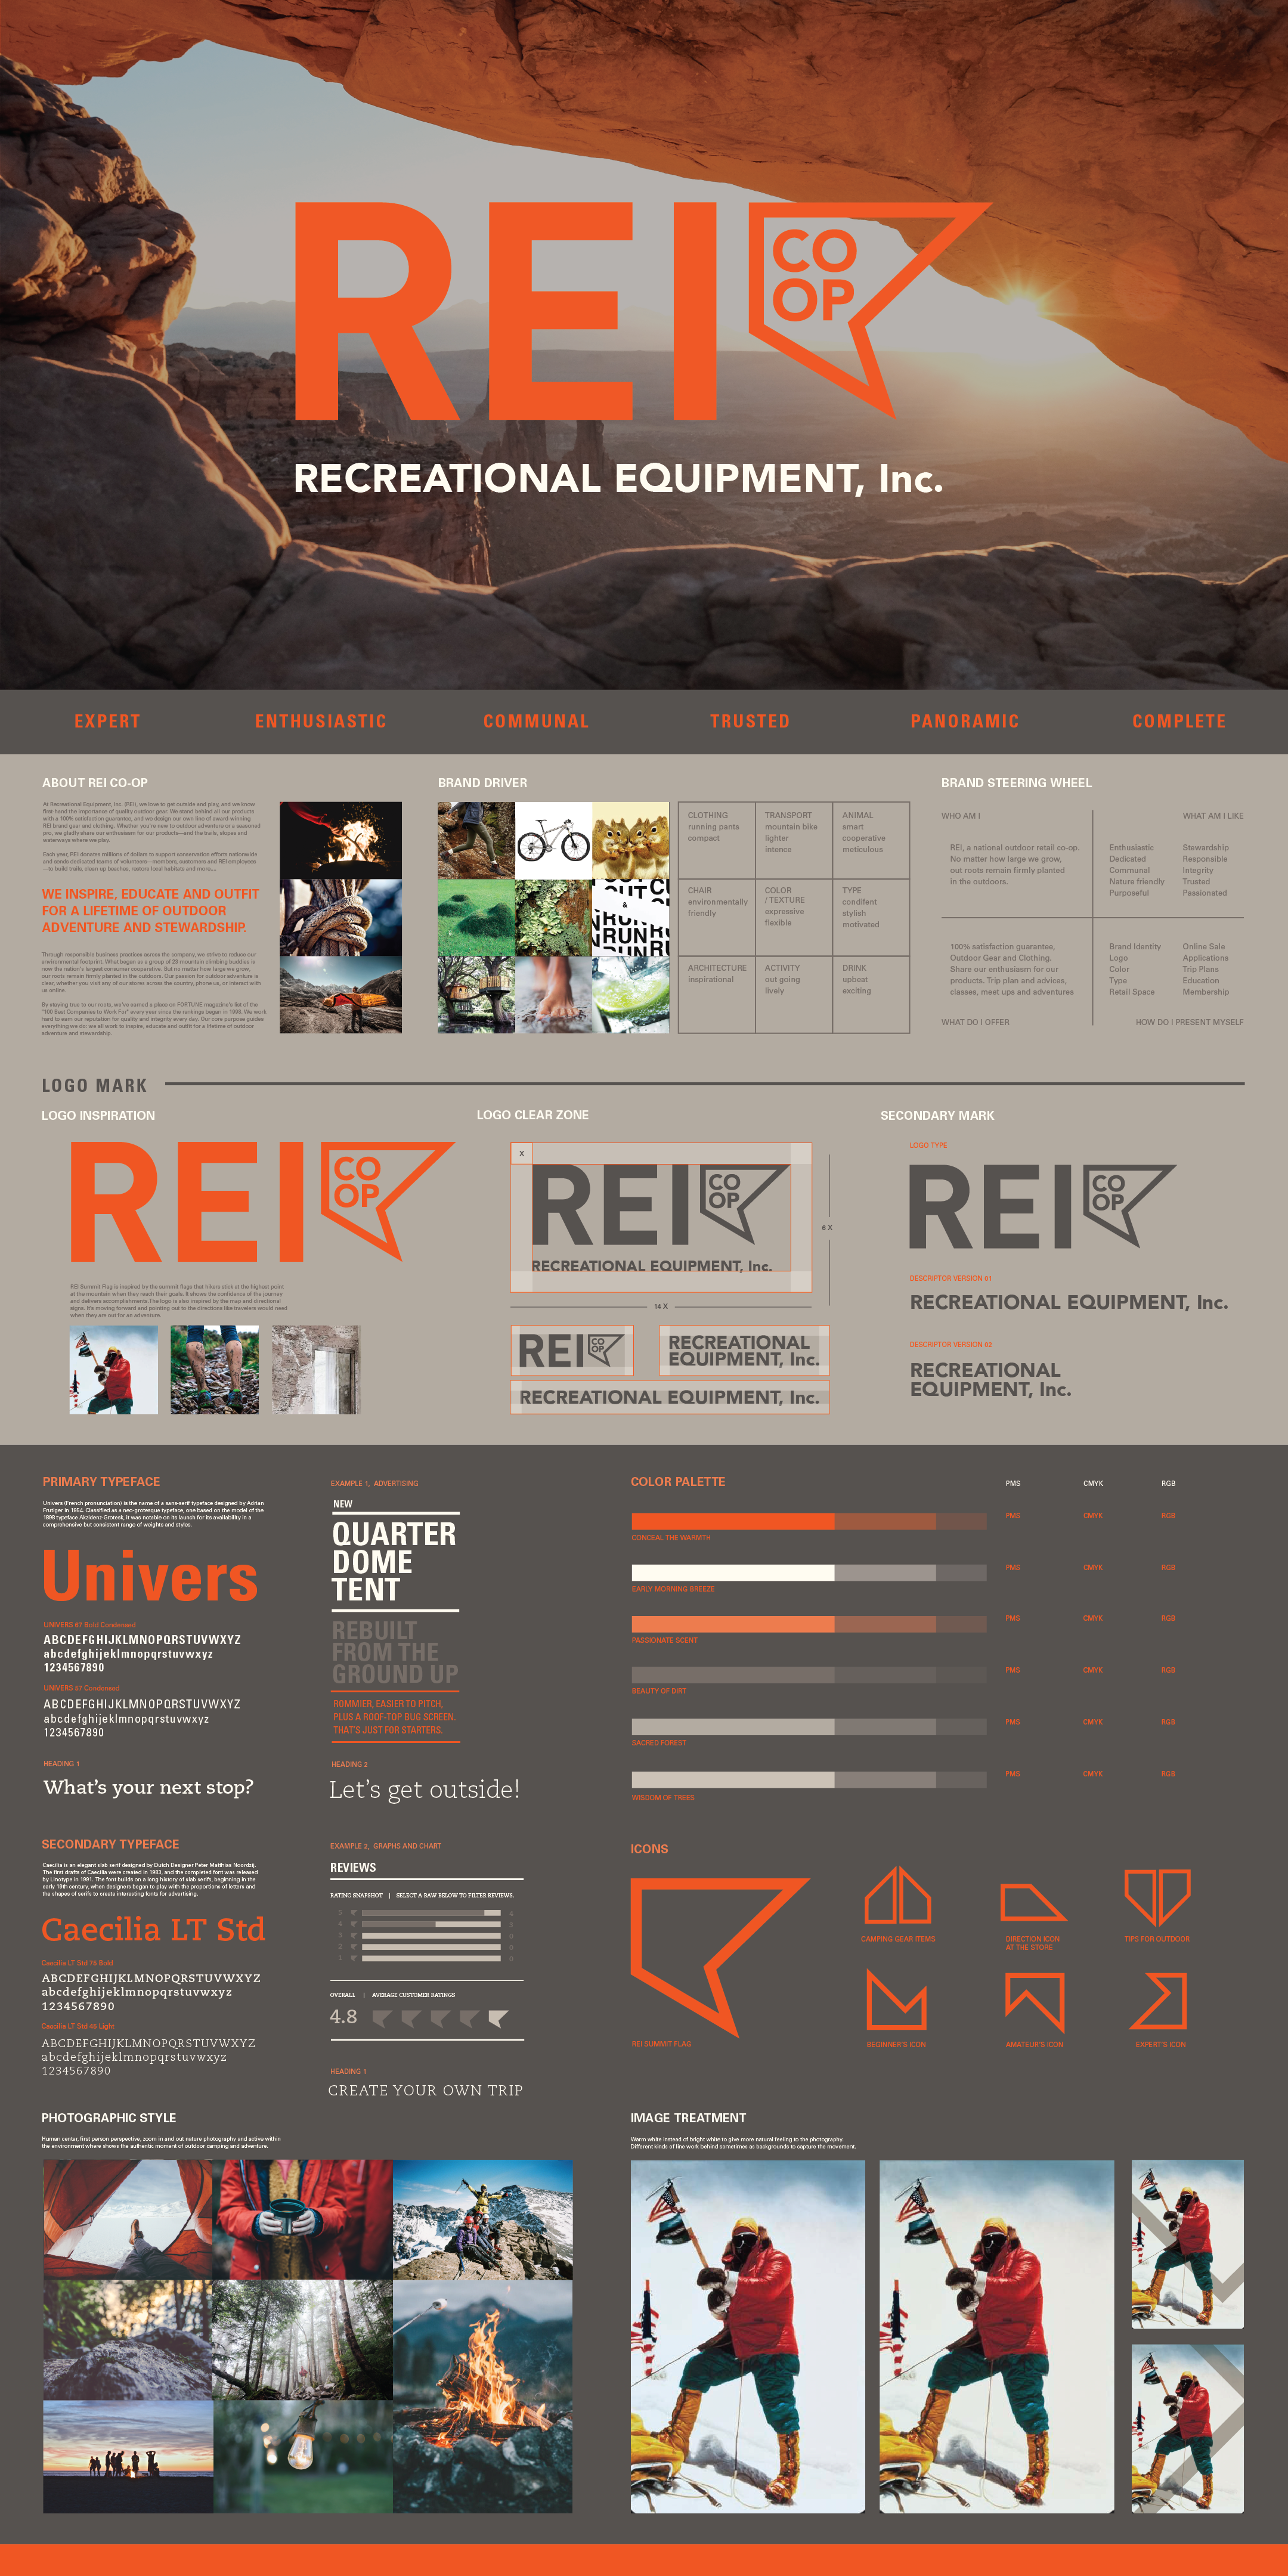 REI_ID SYSTEM_01